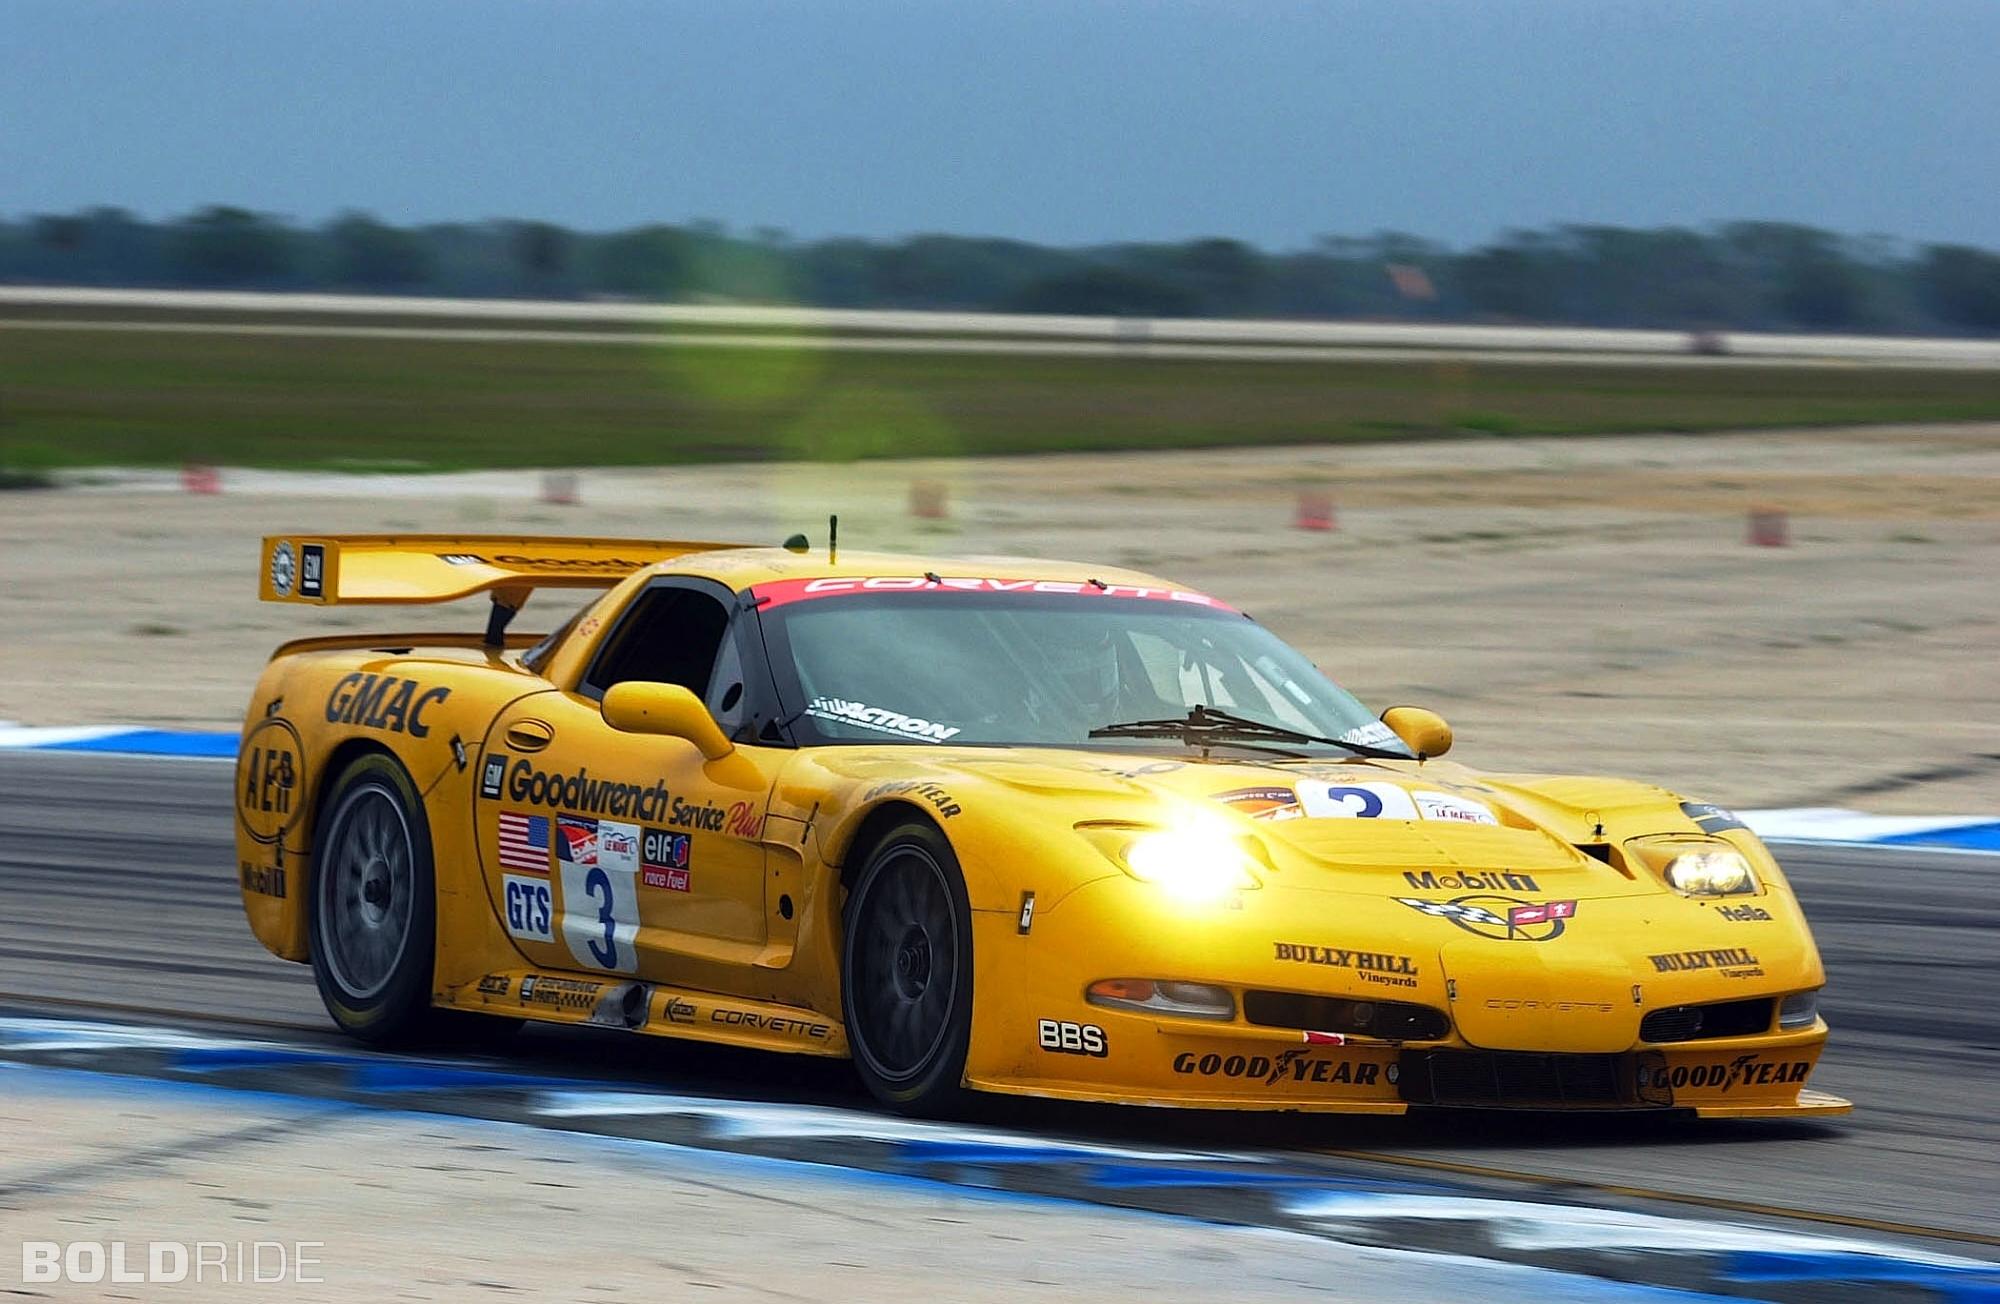 Corvette C5 R supercar supercars race racing k wallpaper background 2000x1304